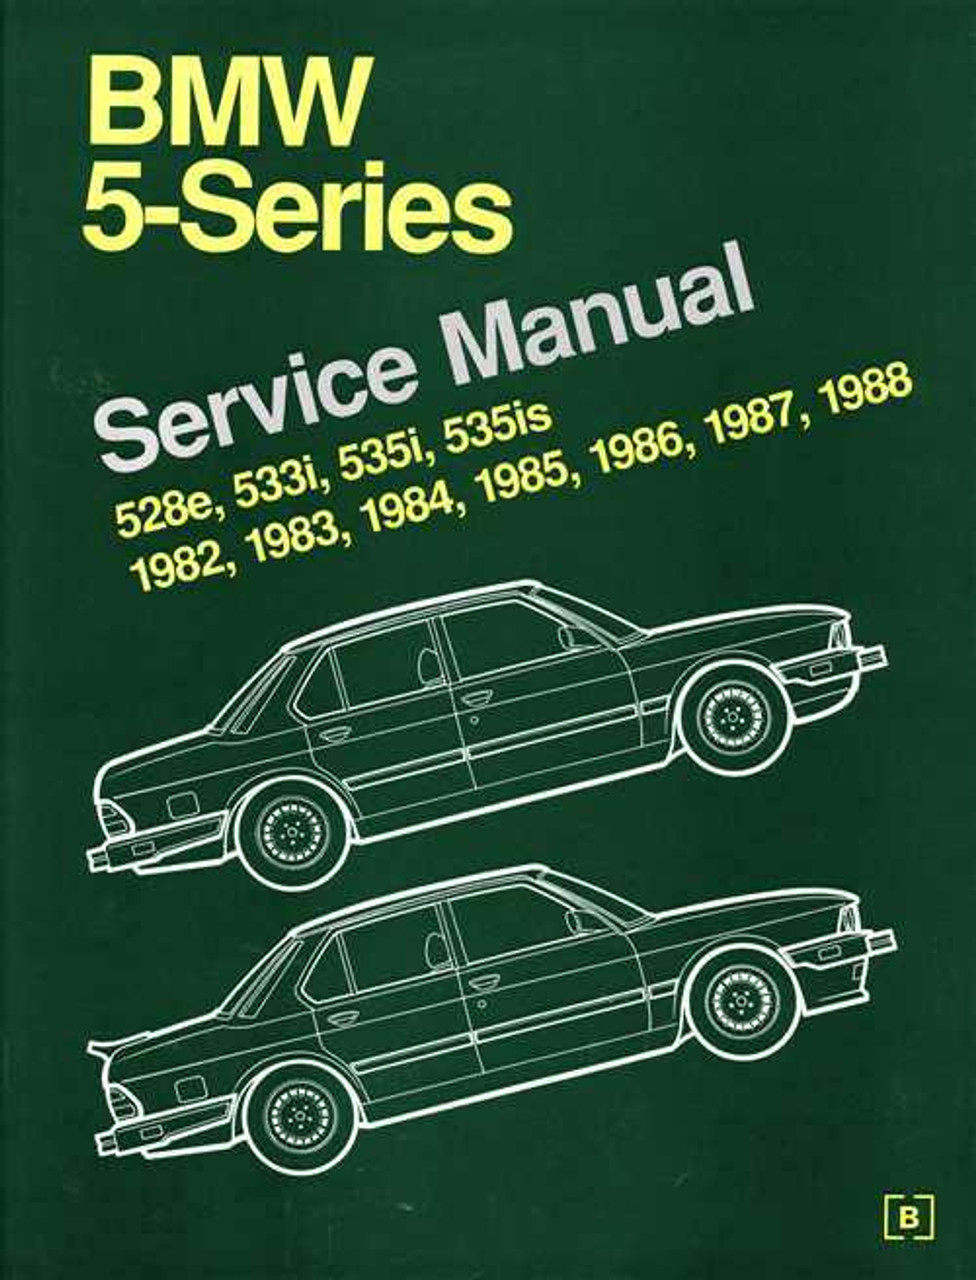 bmw 5 series e28 1982 1988 workshop manual rh automotobookshop com au bmw e28 520i service manual bmw 520i e34 owners manual download